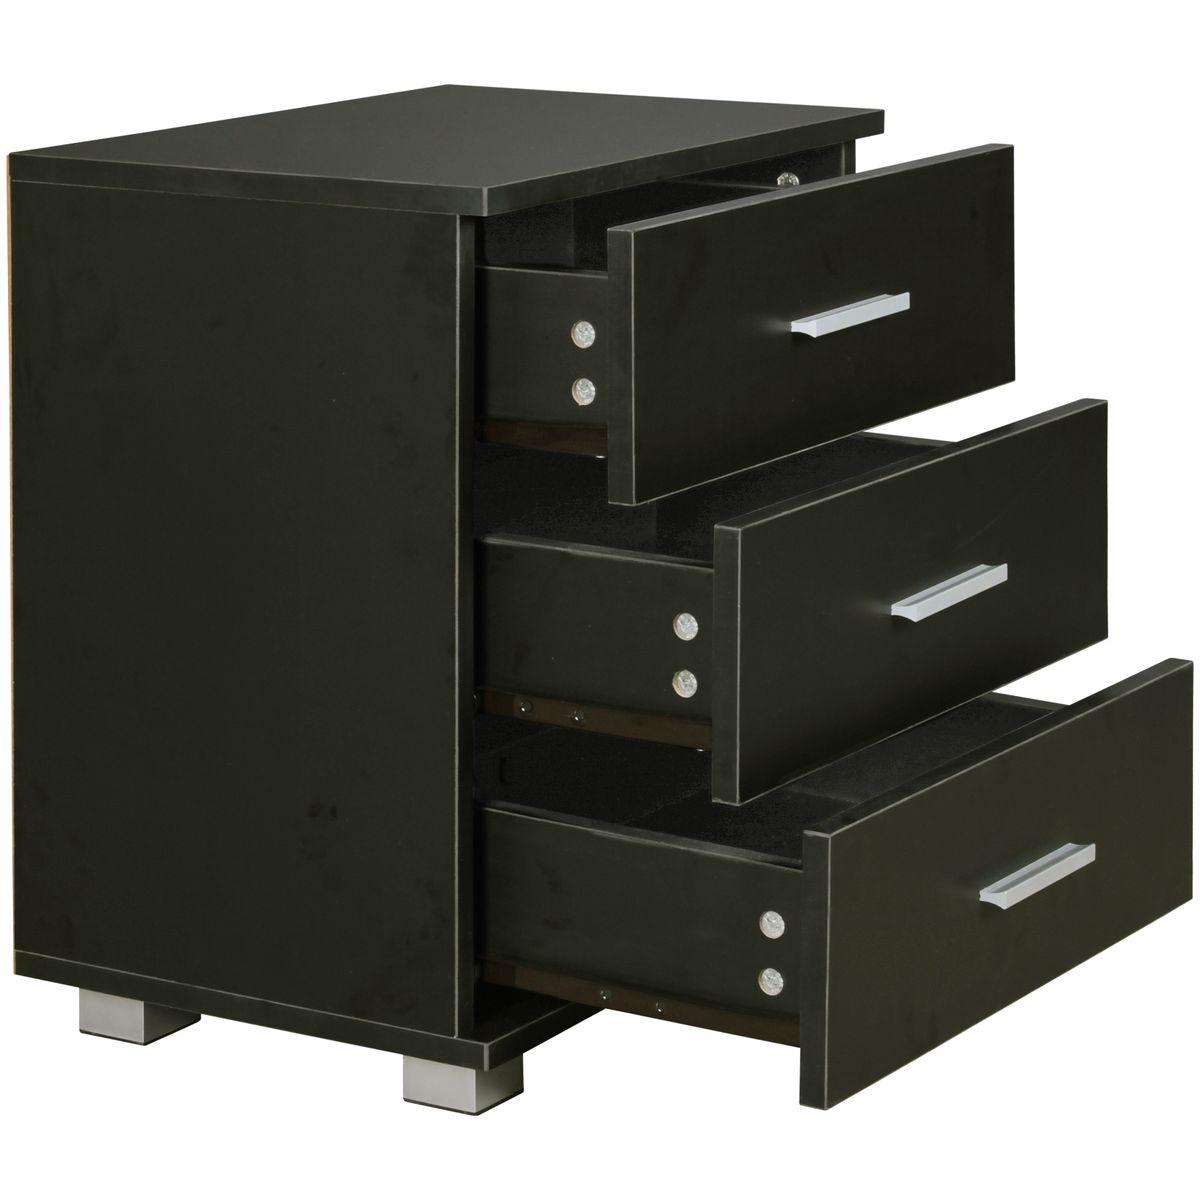 nachtkonsole nachtschrank holz nachtk stchen schlafzimmer. Black Bedroom Furniture Sets. Home Design Ideas